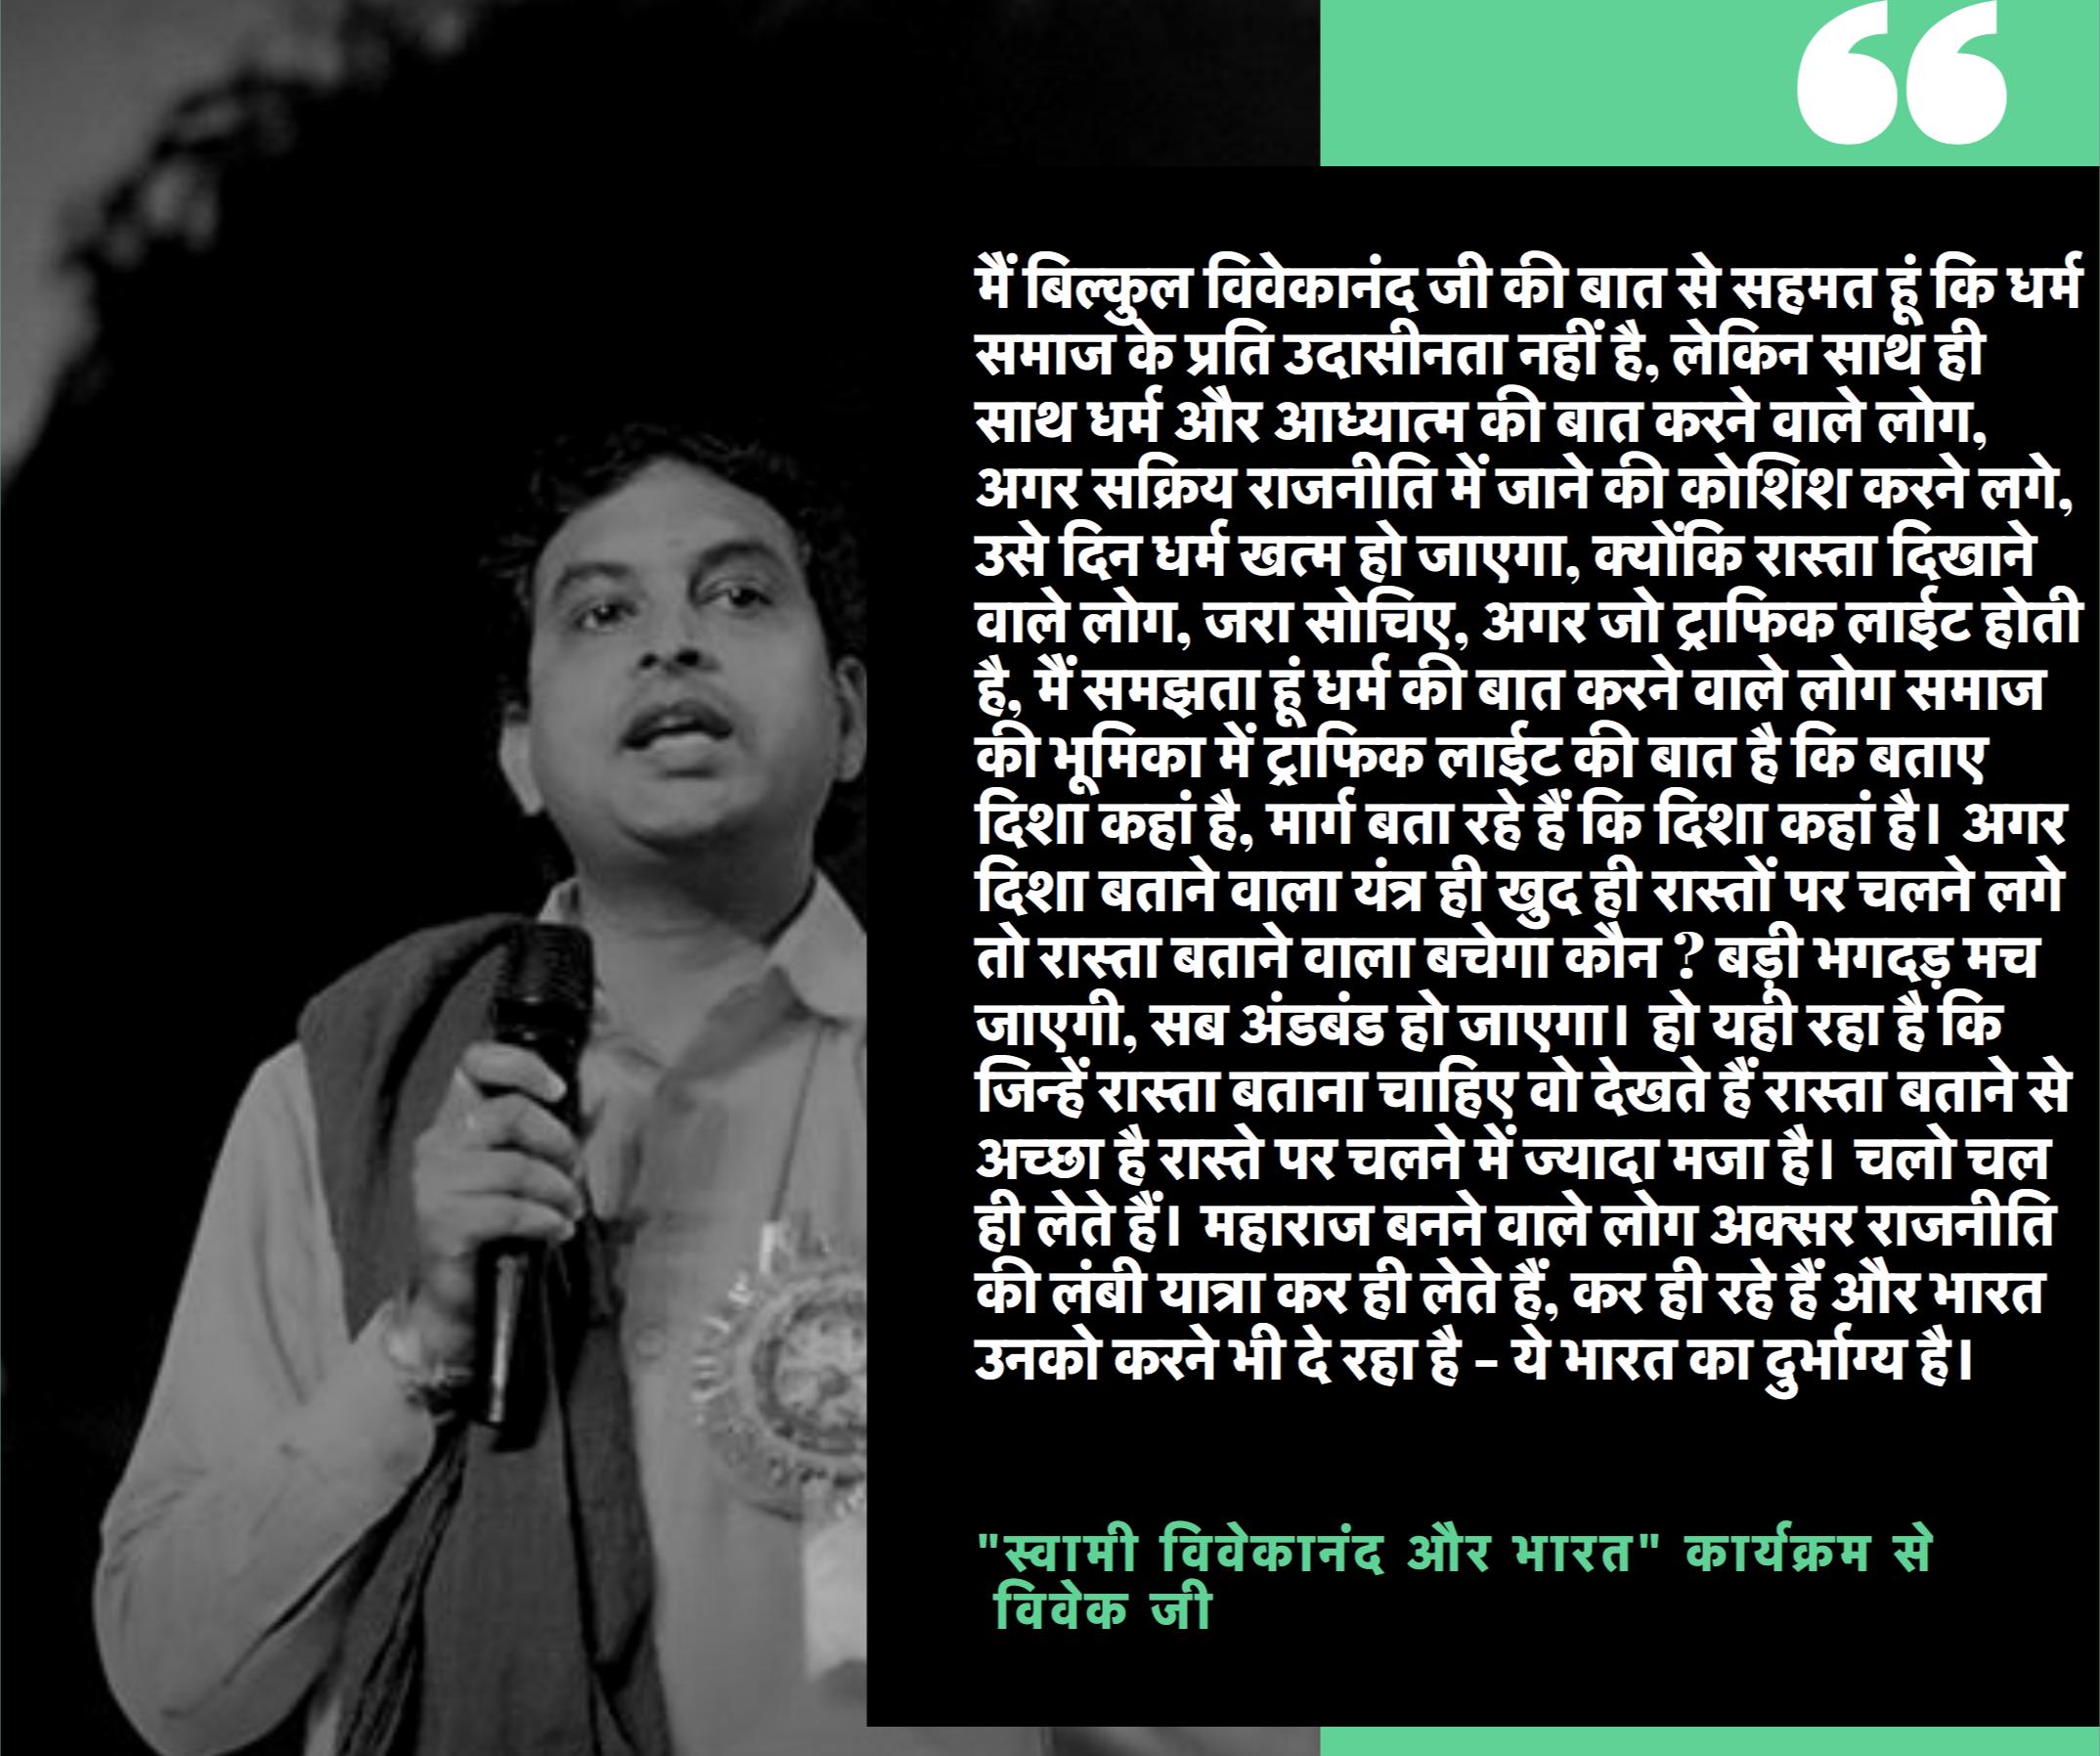 Politics and swami ji